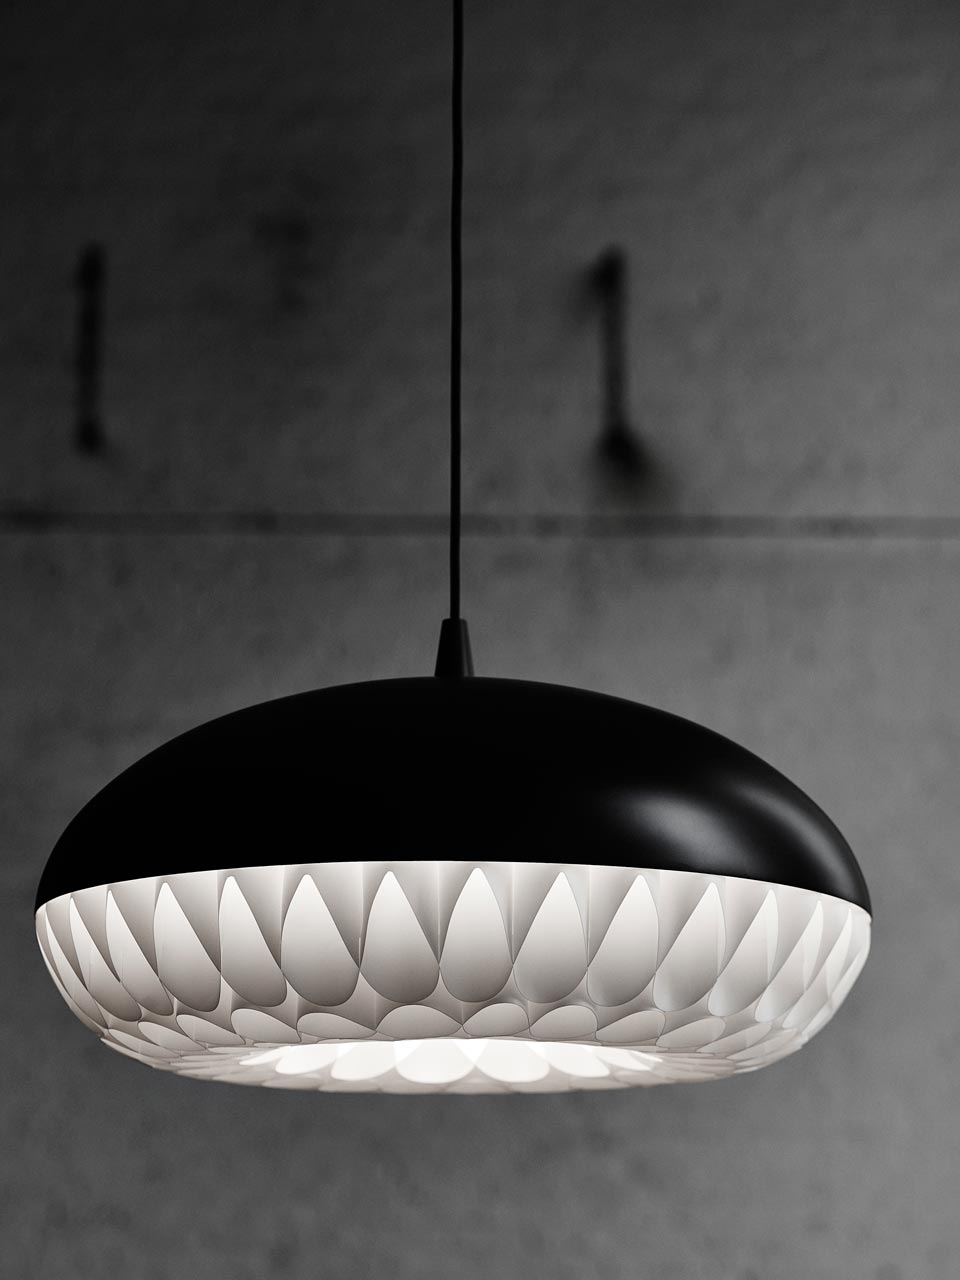 grande suspension aeon rocket noire par light years suspension design m tal noir r f 15110003. Black Bedroom Furniture Sets. Home Design Ideas